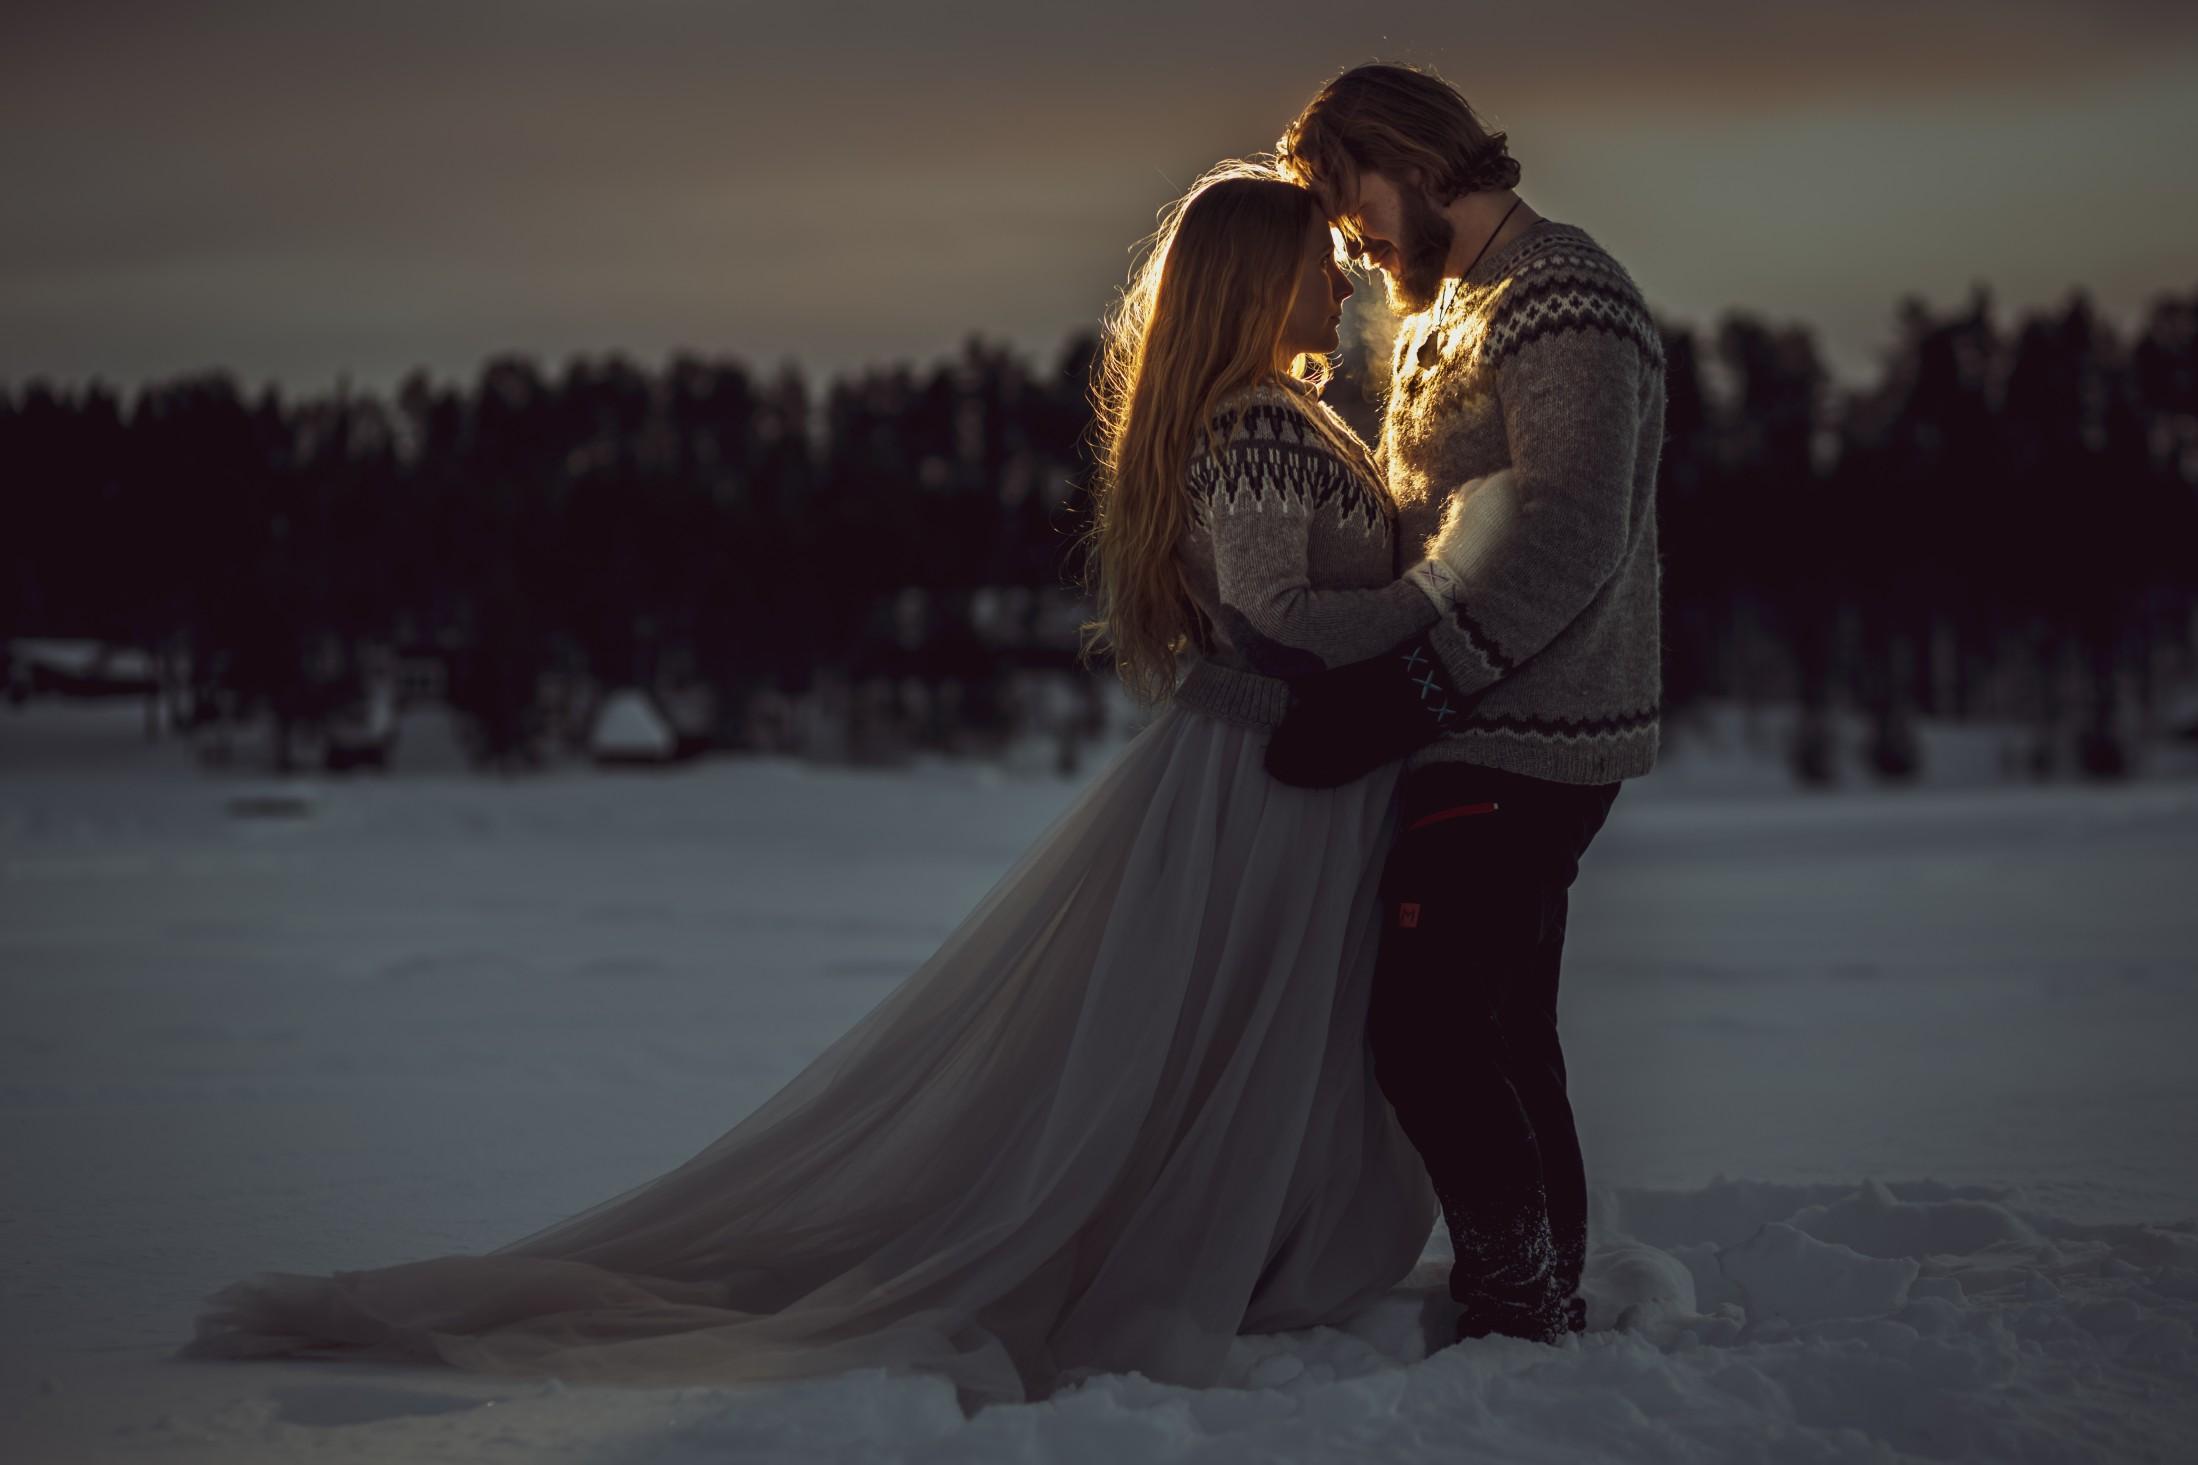 winter wedding at icehotel sweden - cinematic wedding photography - ice wedding - elopement in sweden - creative wedding photographer - unconventional wedding - alternative wedding - unique wedding - bride and groom in snow